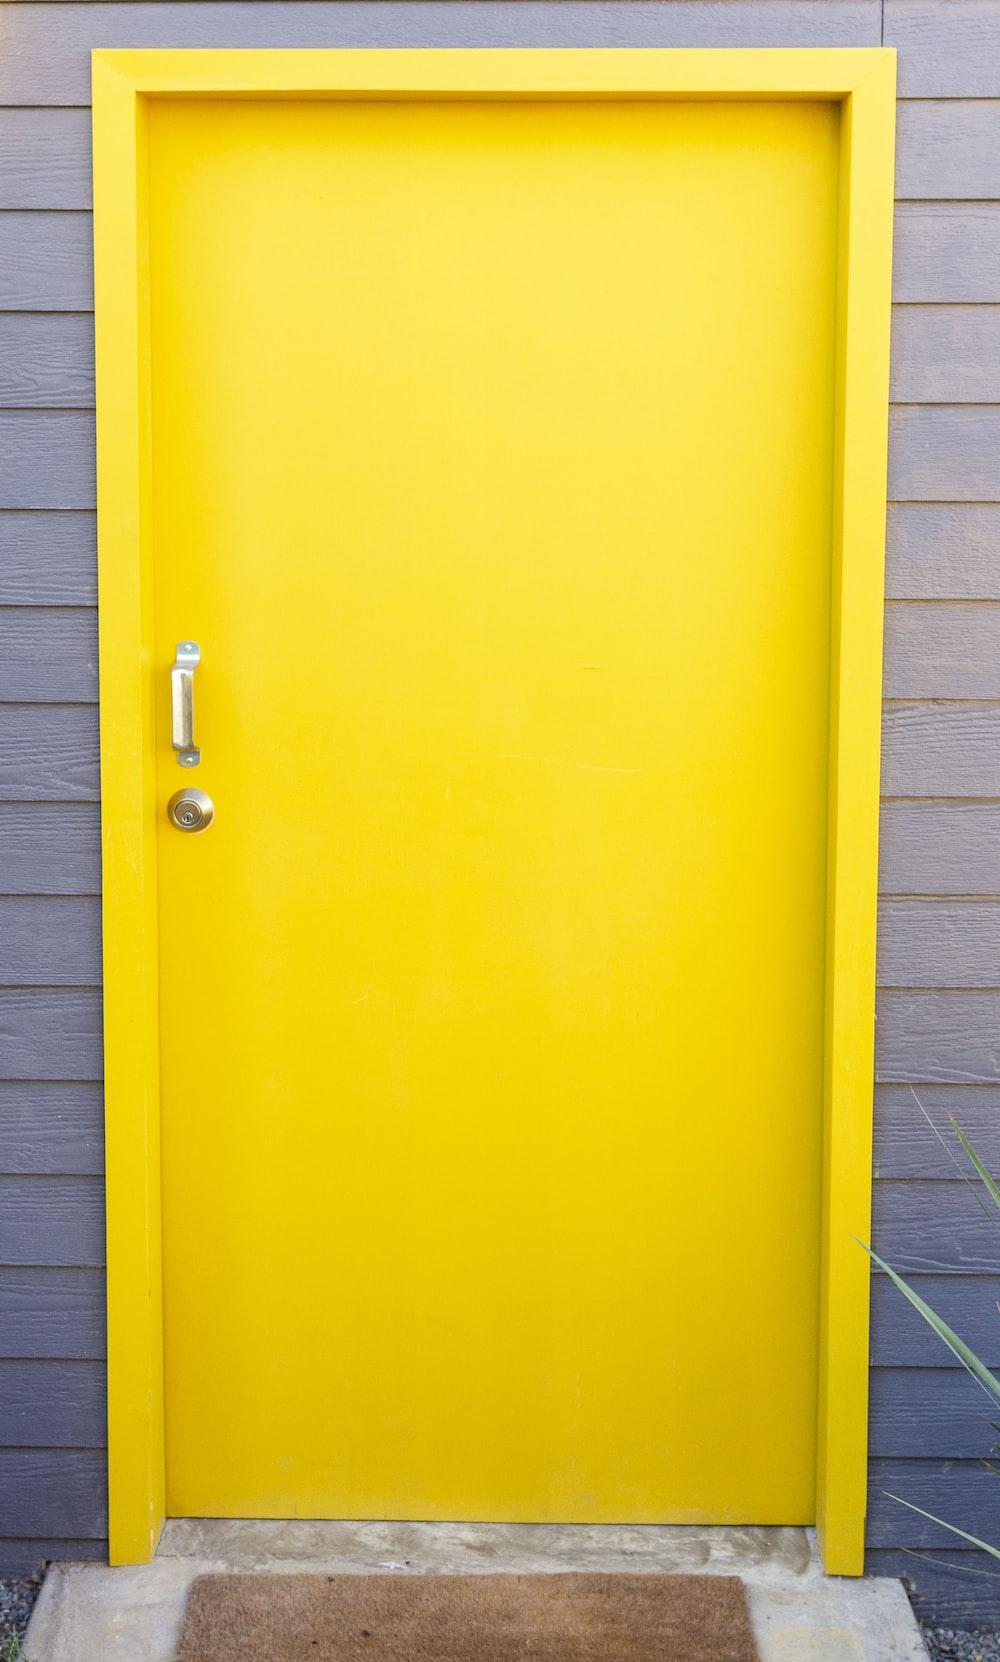 yellow wooden door closed during daytime